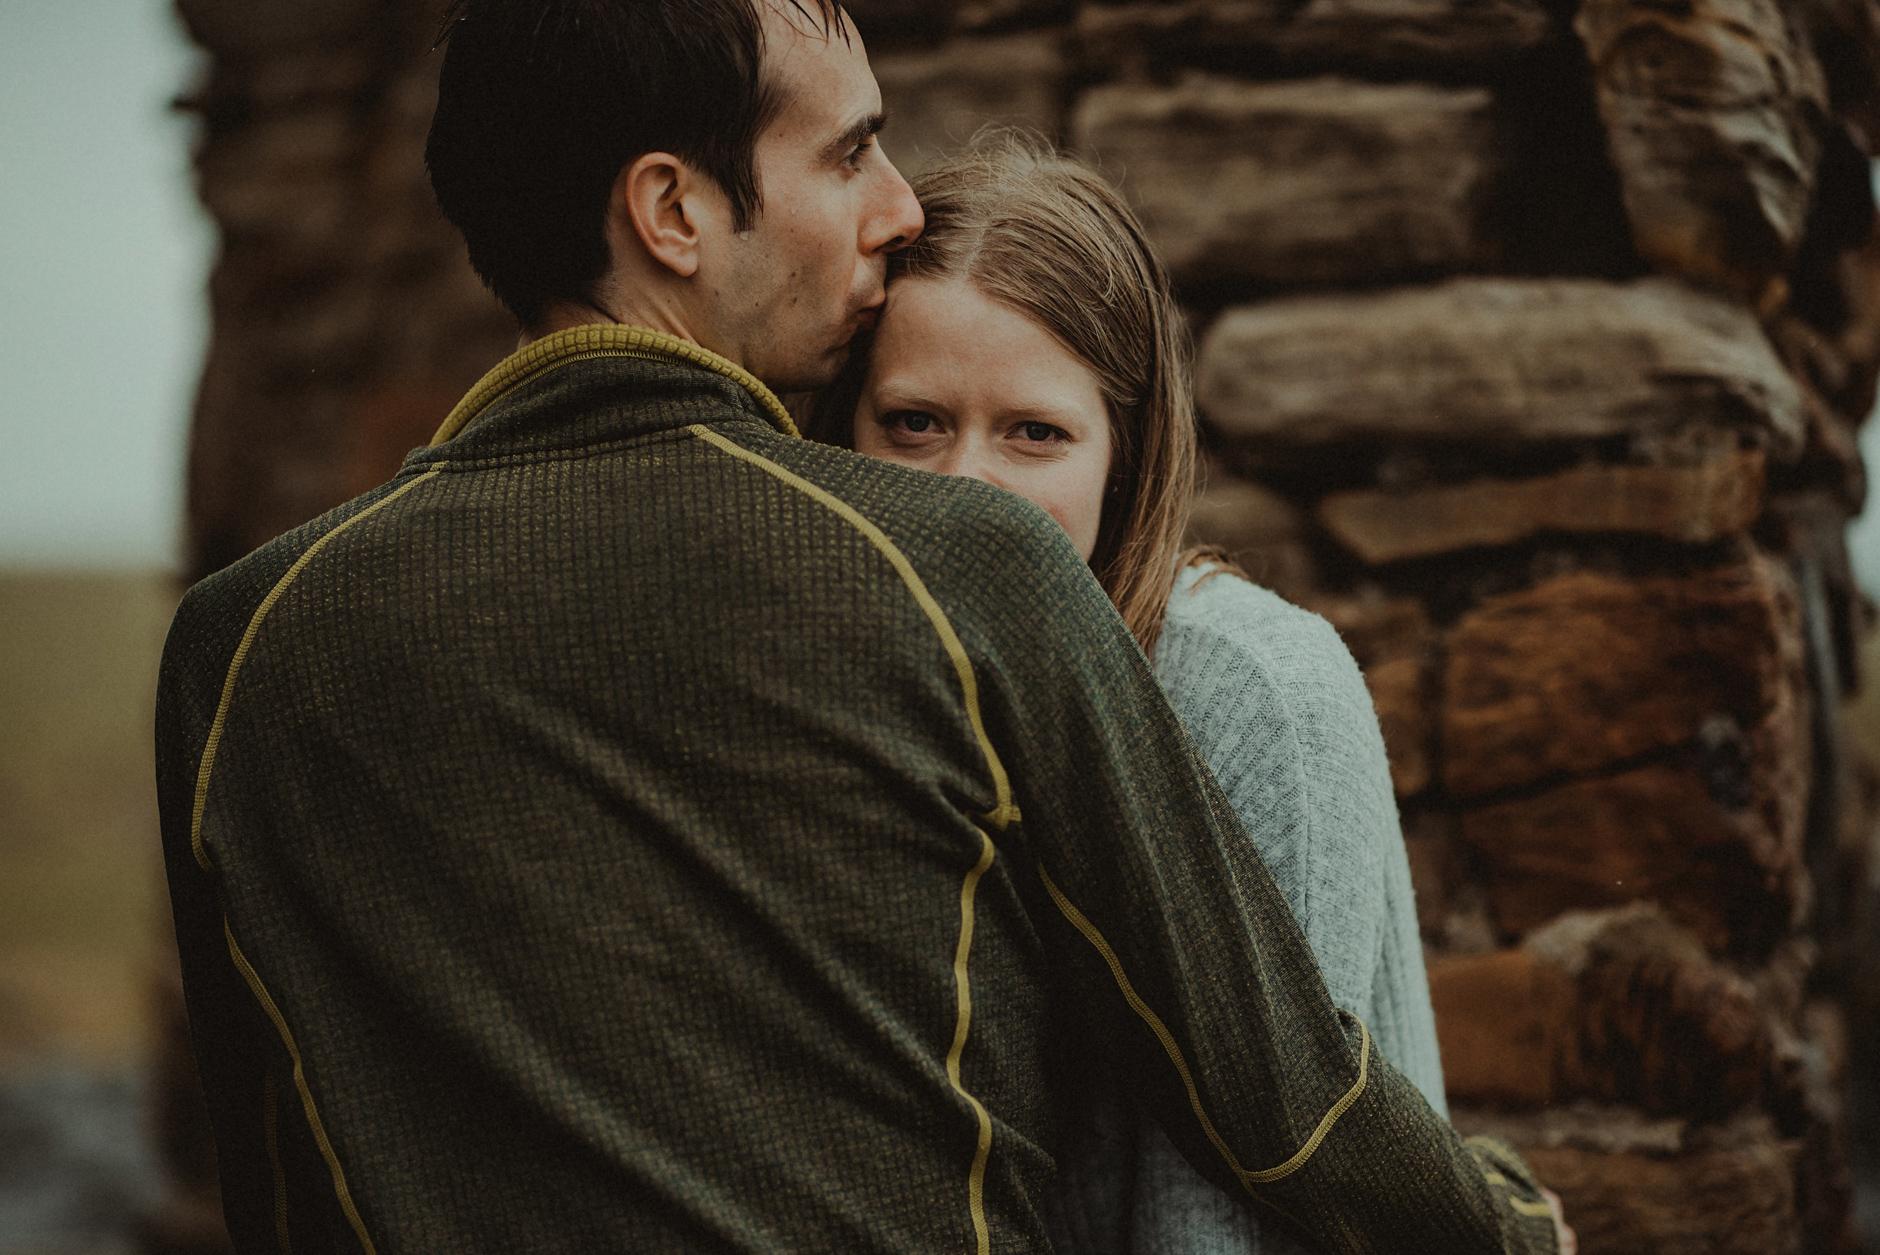 Elie_Wedding_Photographer_Alternative_Nikki_Leadbetter_Photography-10.jpg